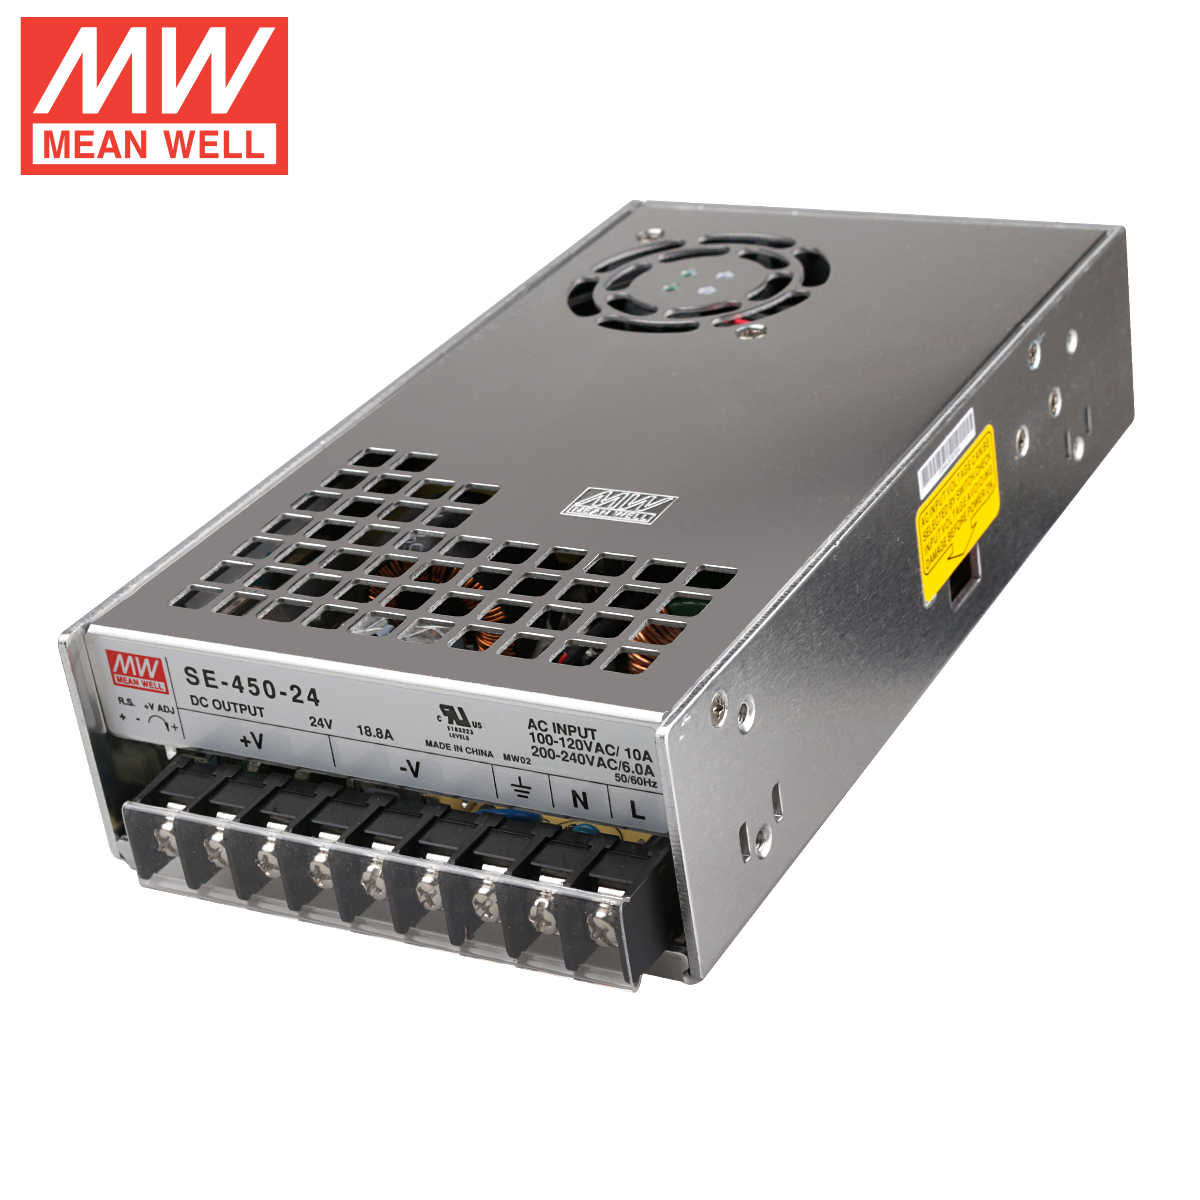 BLV MGN Cube 3d drucker gute qualität netzteil Geniune Meanwell NETZTEIL SE-450-24 24V18. 8A 450 W